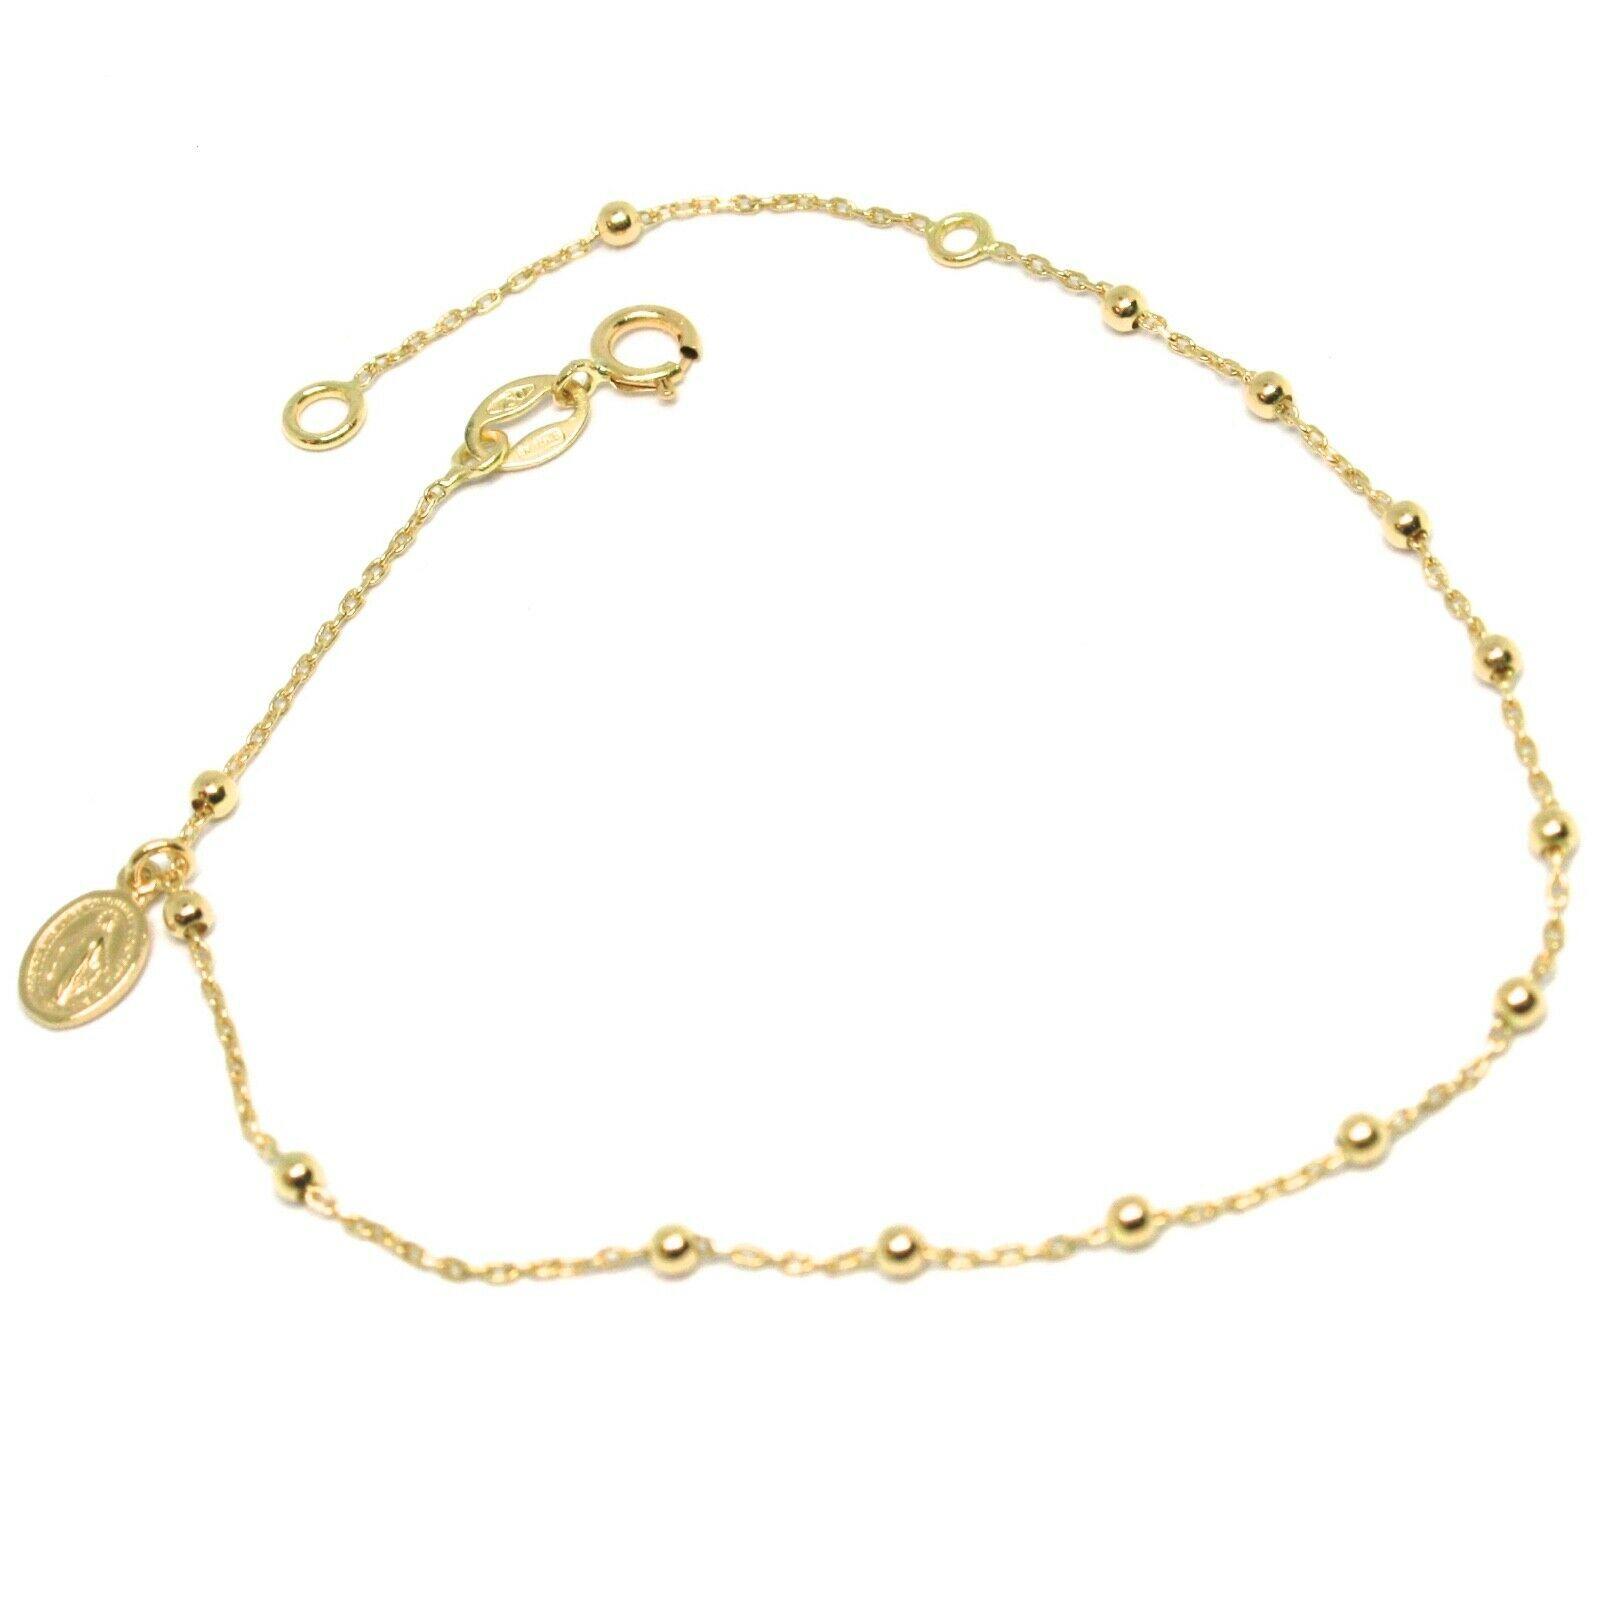 Mini Armband Gelbgold oder Weiß 750 18K, Rosenkranz, Medaille Miracolosa, 18 CM